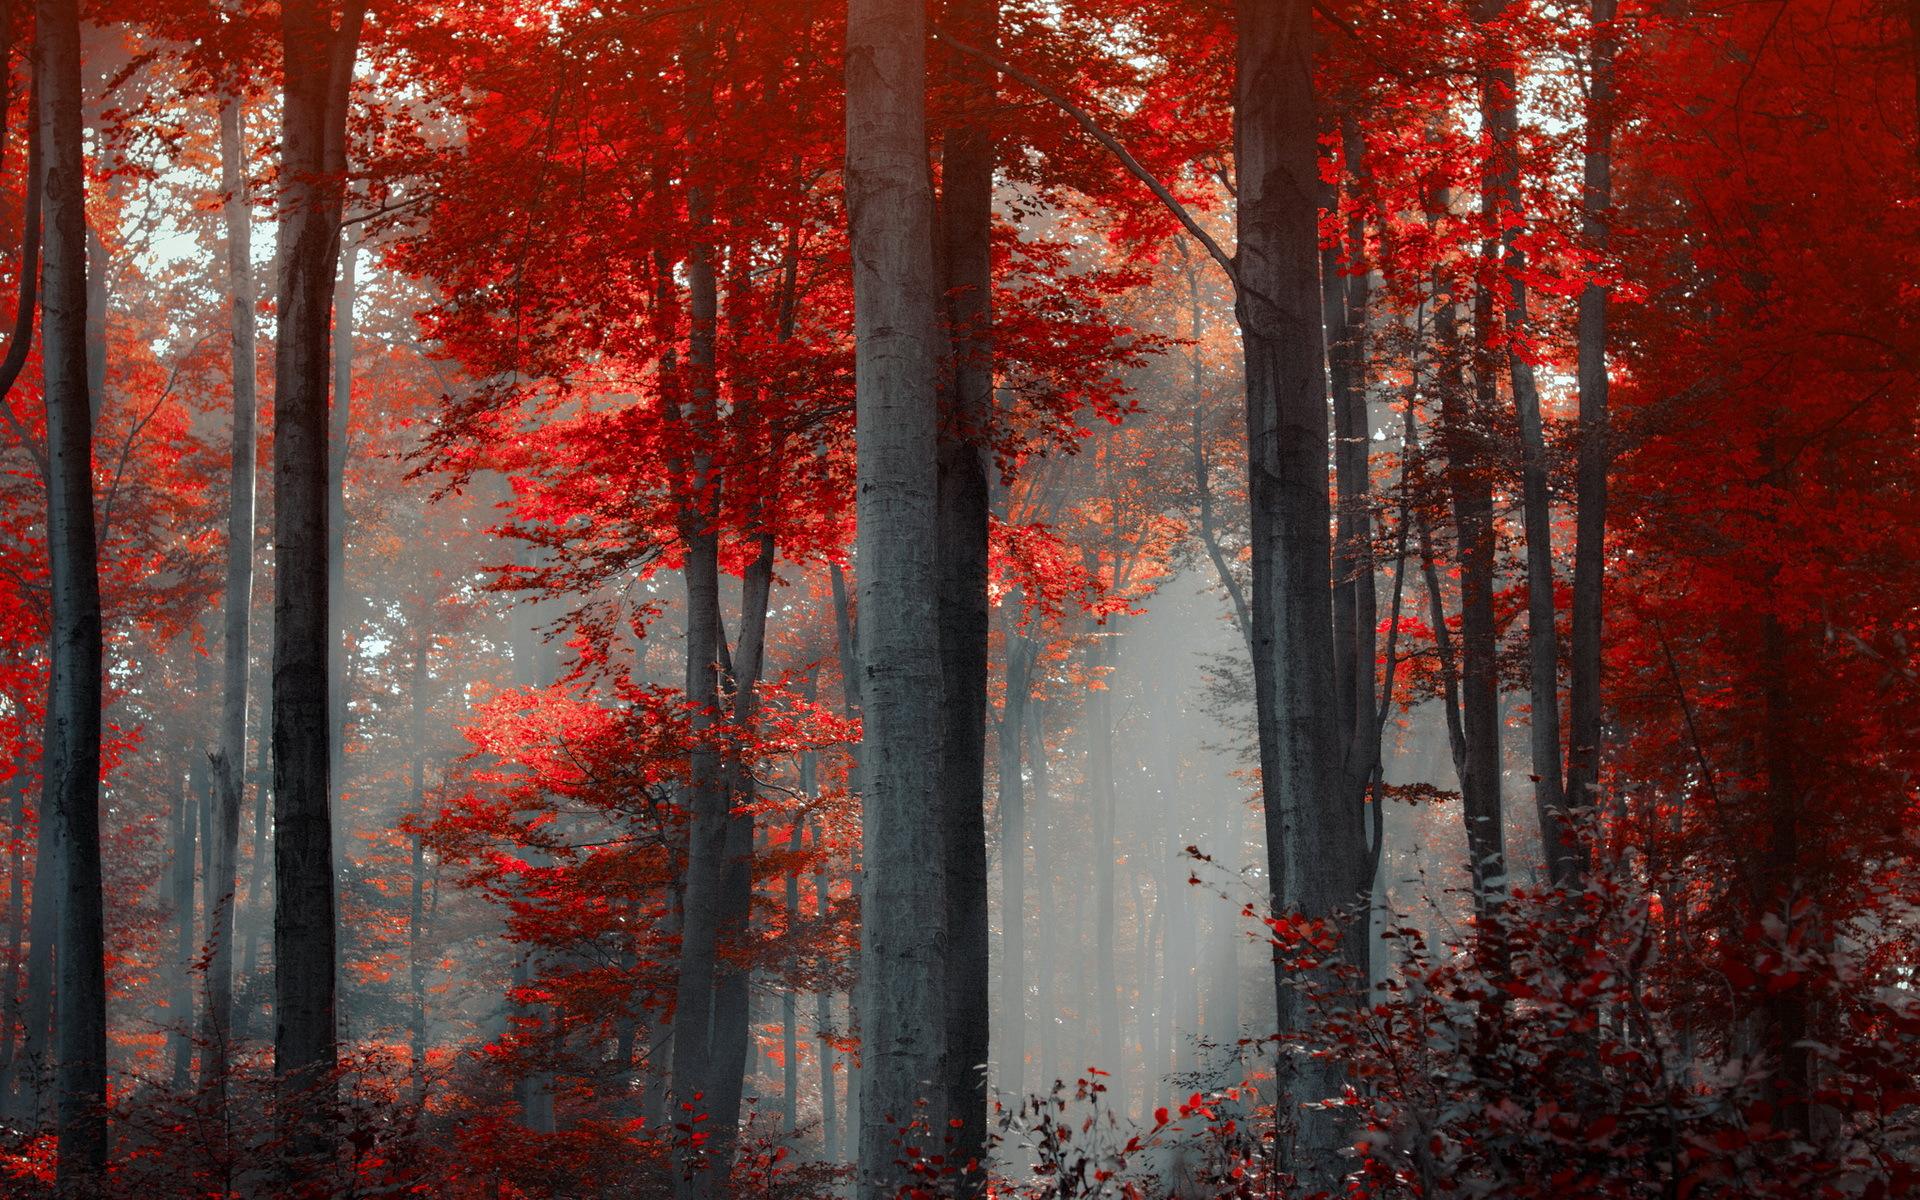 color wallpaper images nature